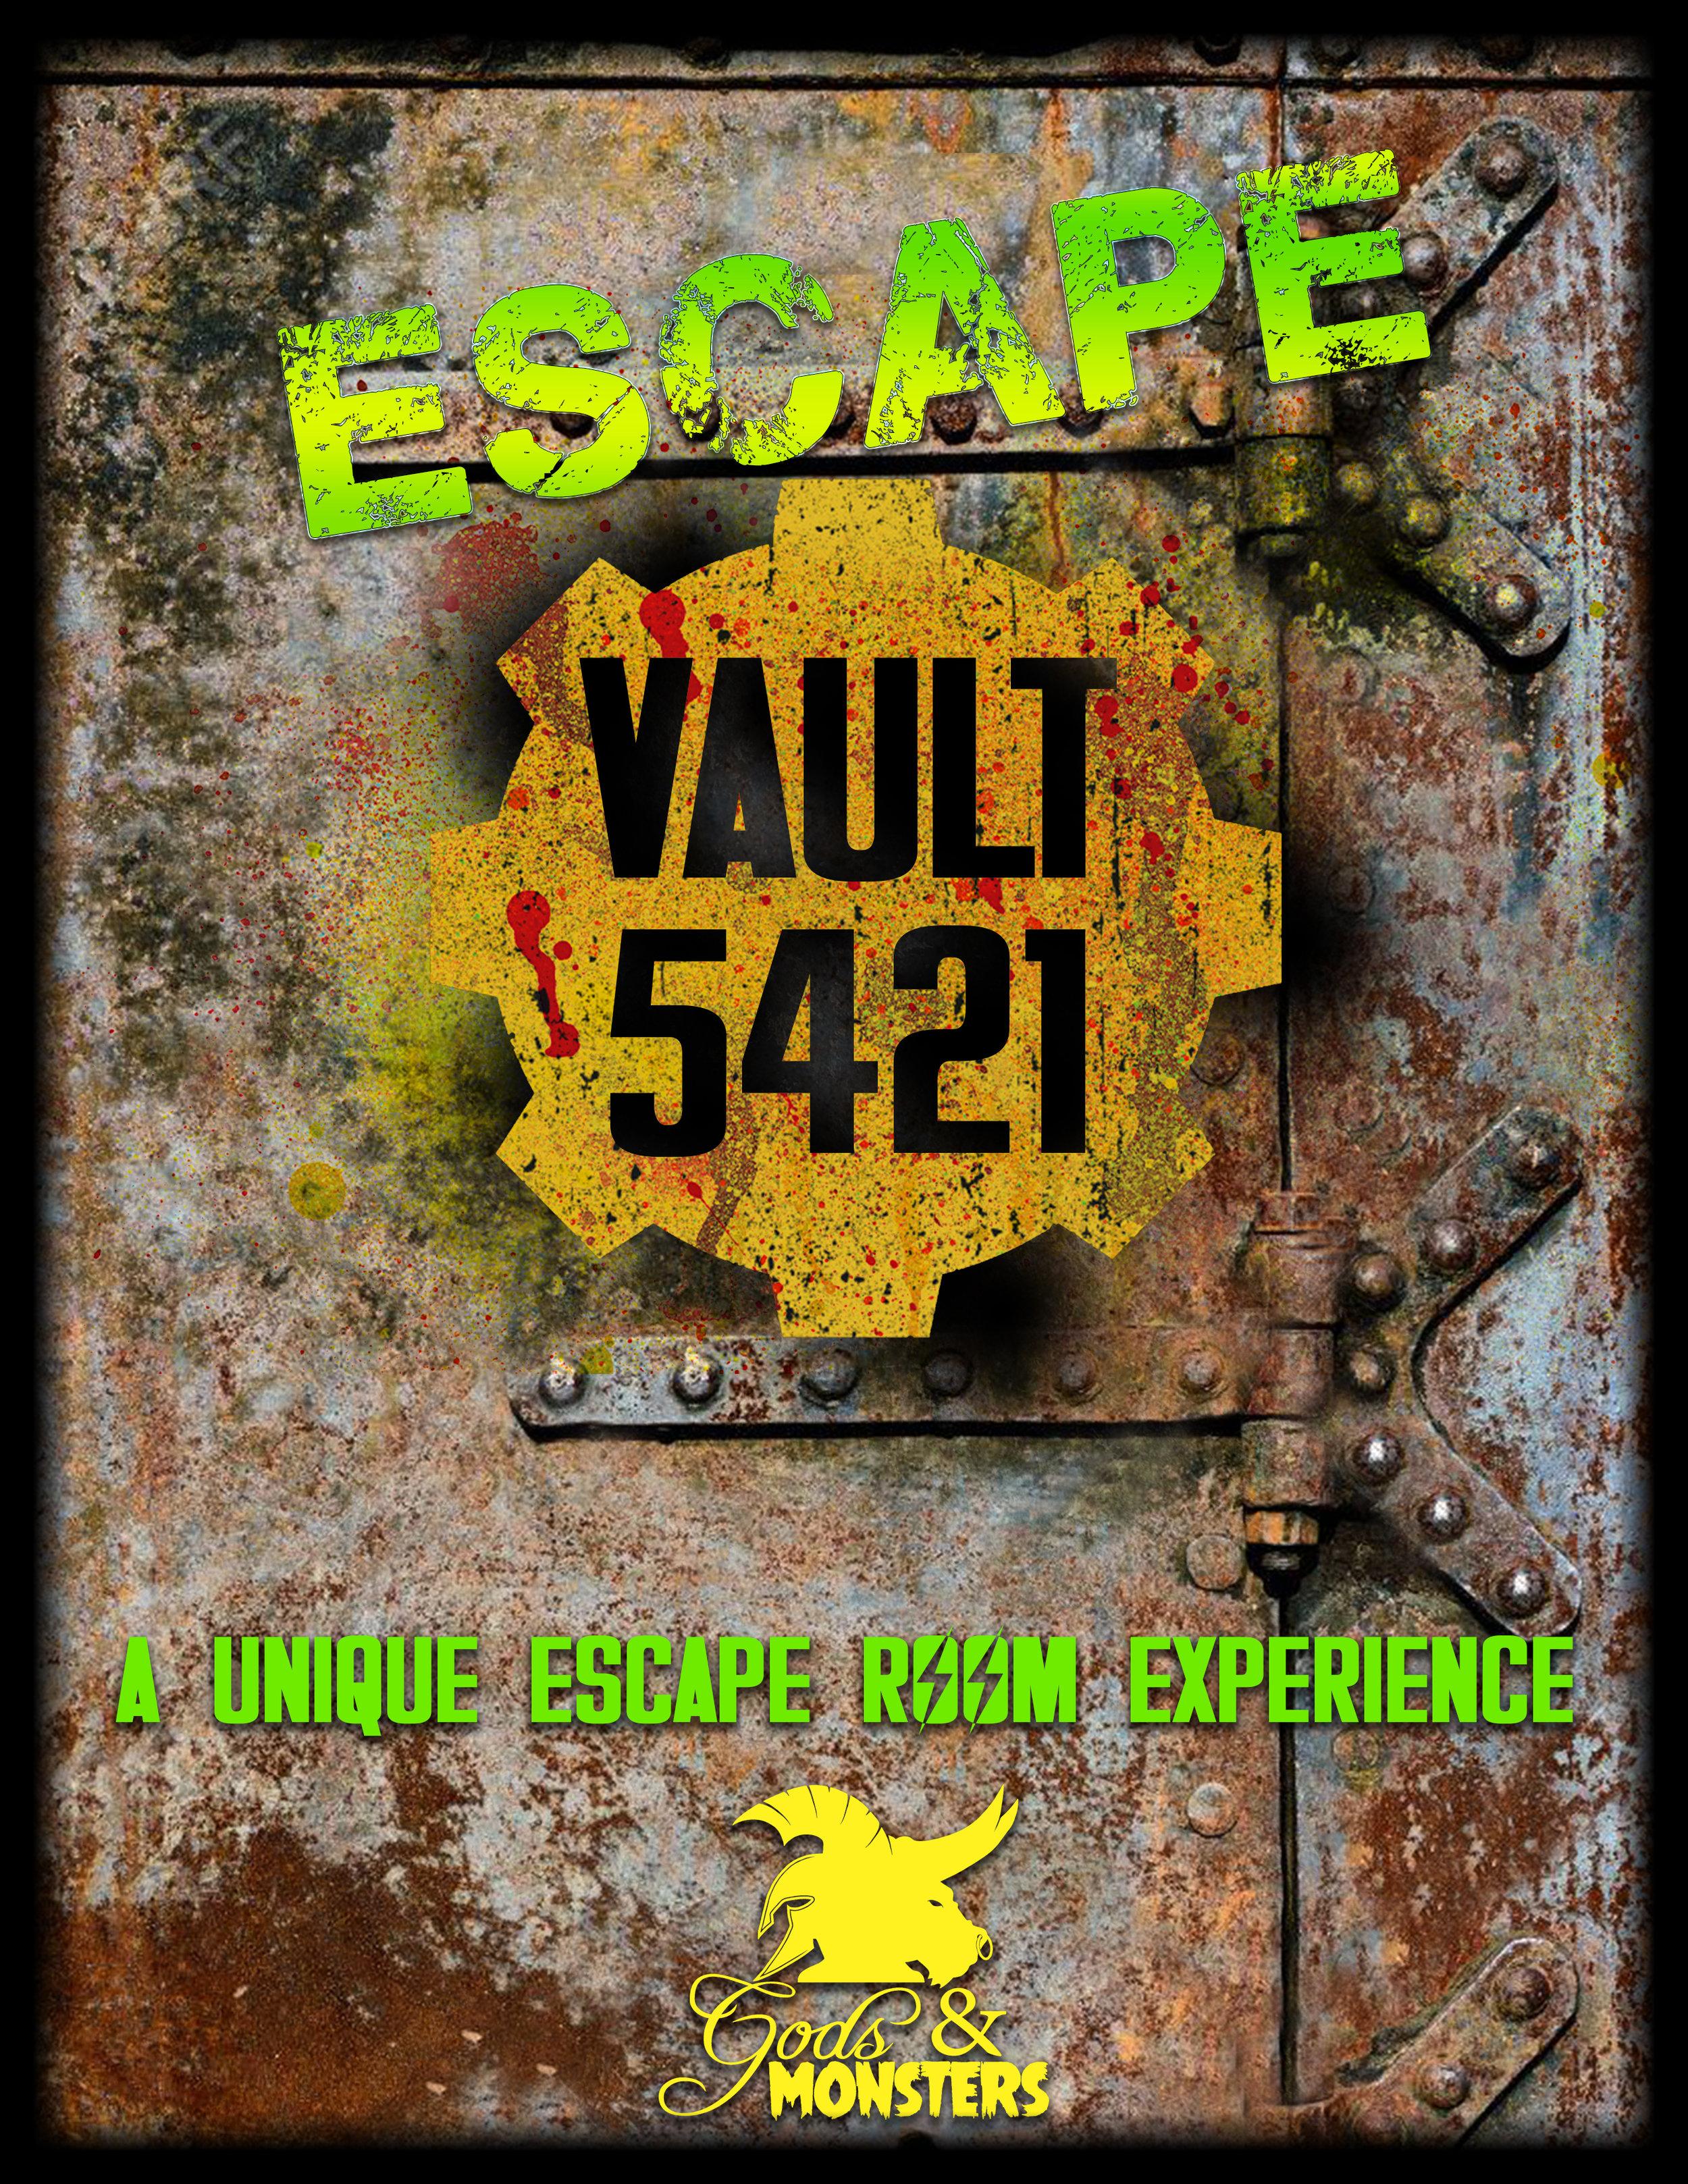 escapethevault.jpg